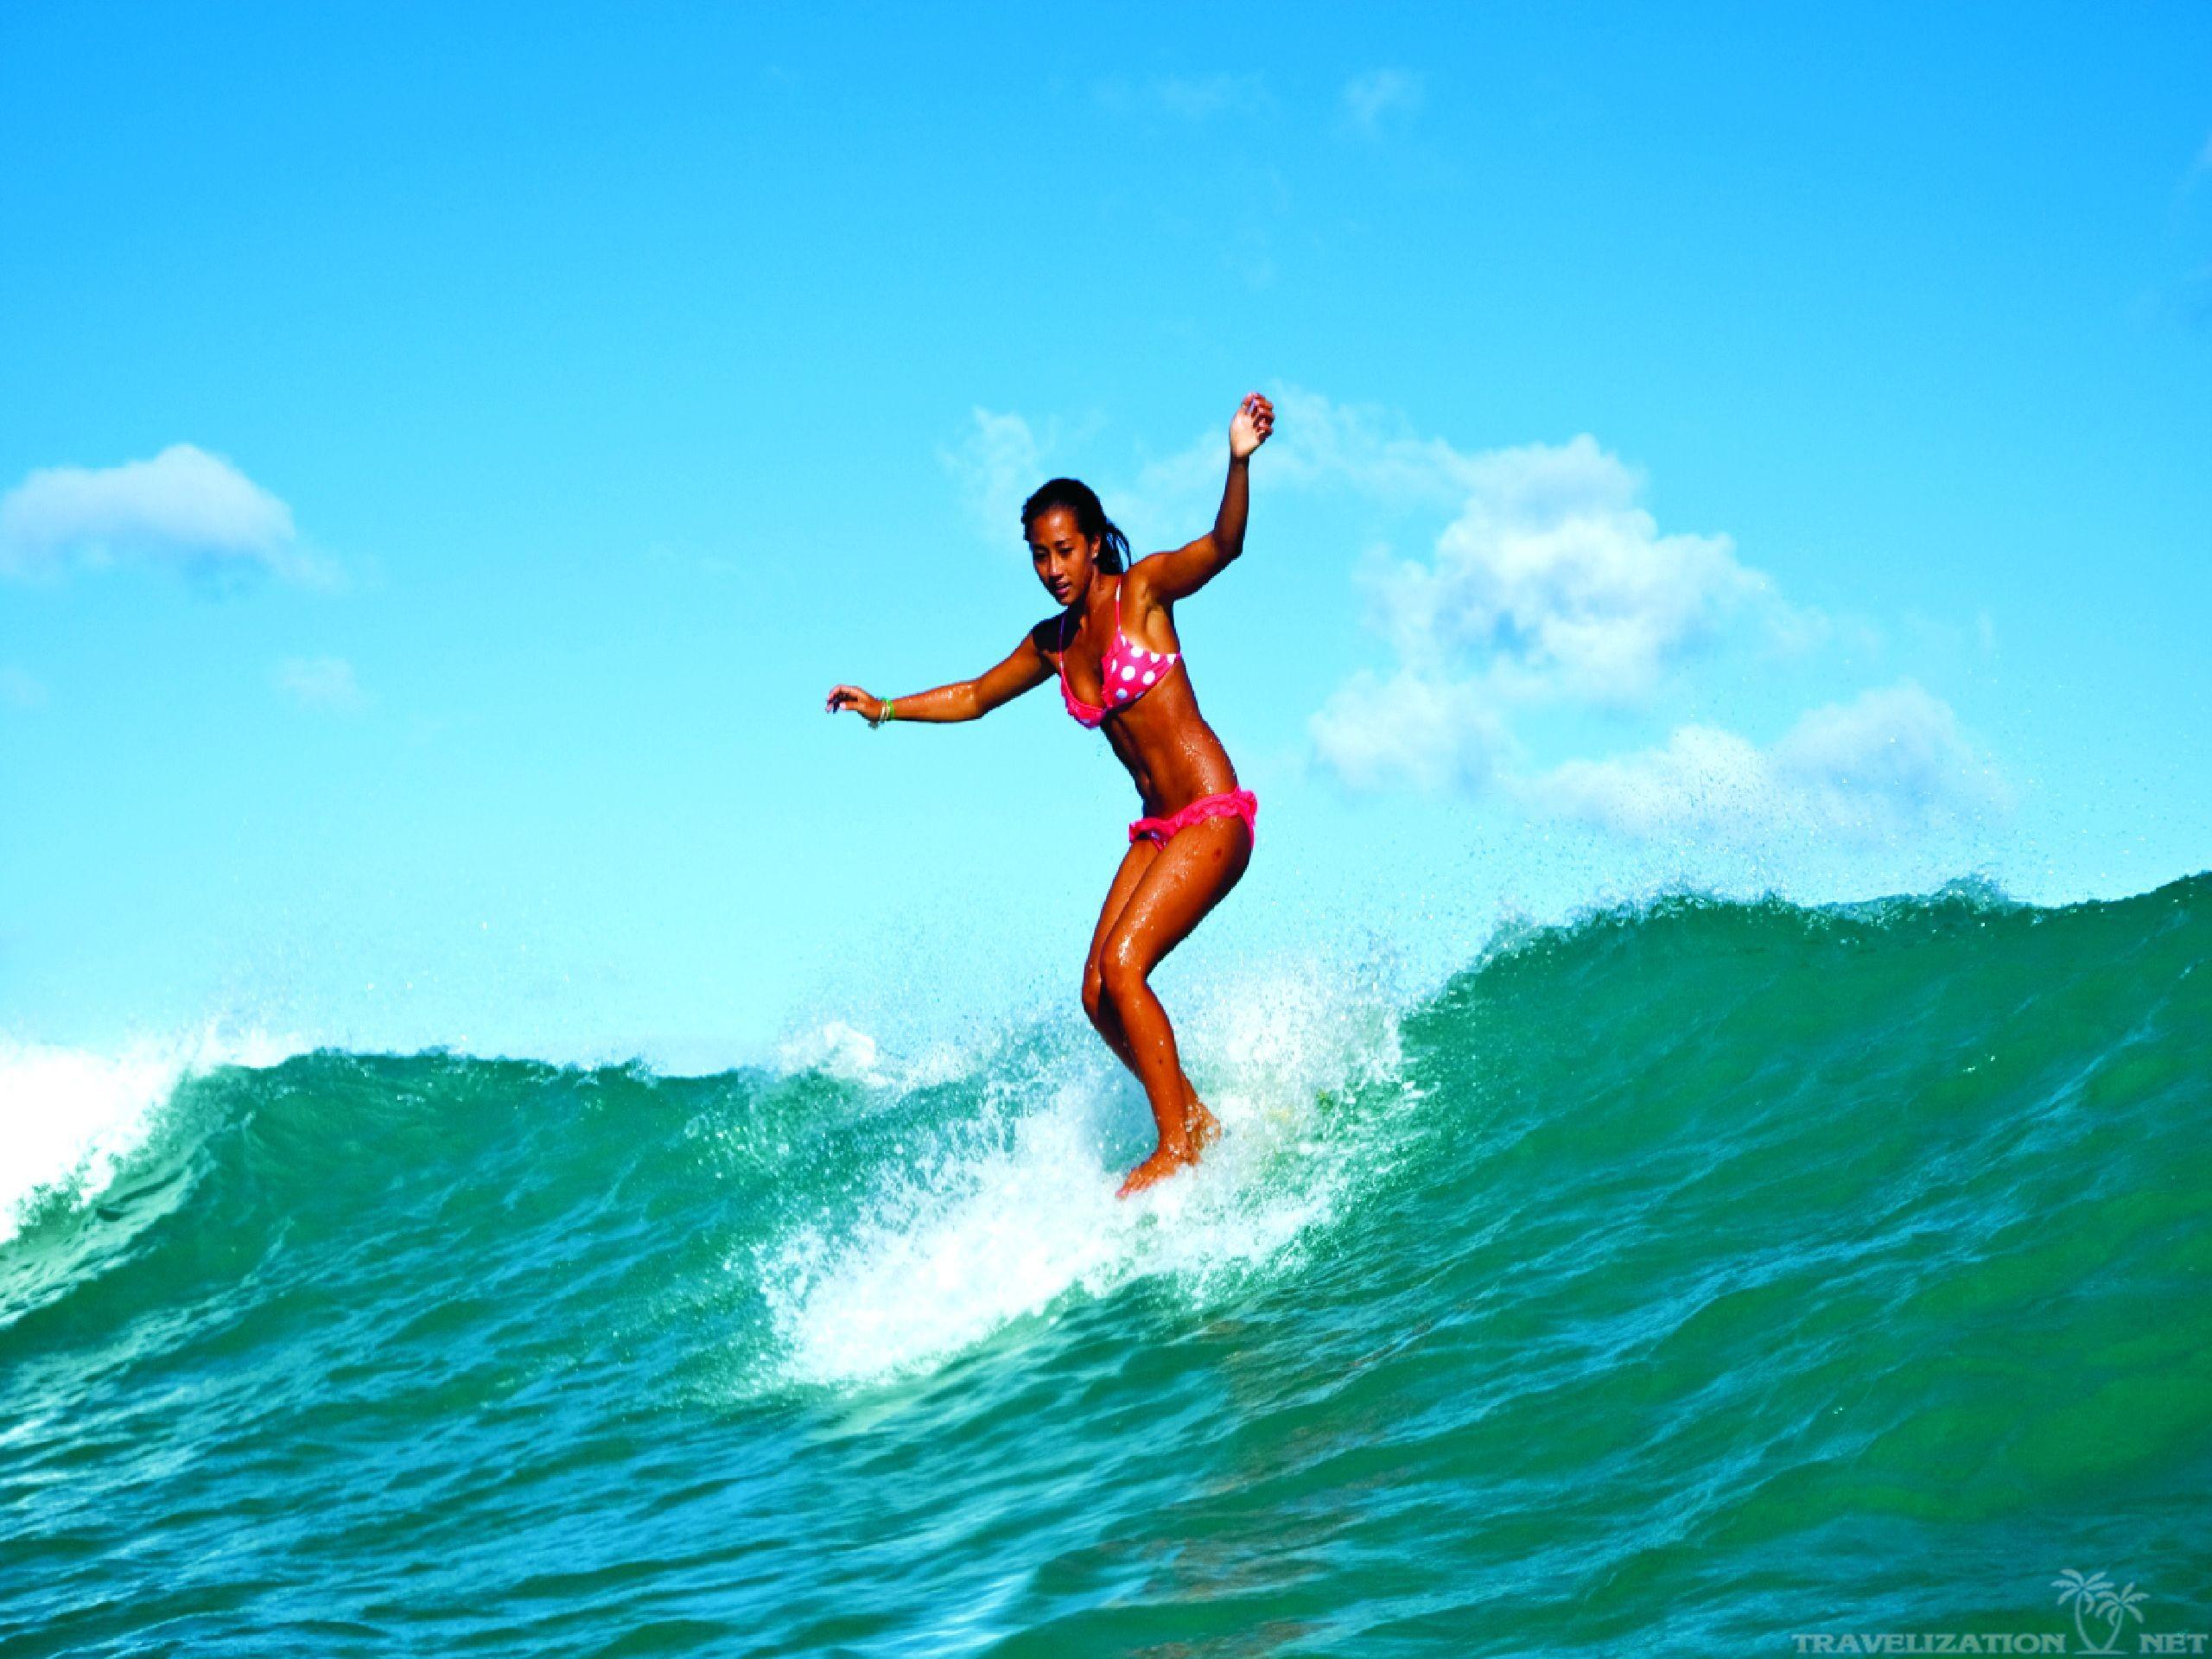 солнце, серфинг, море, доска, волна. ветер